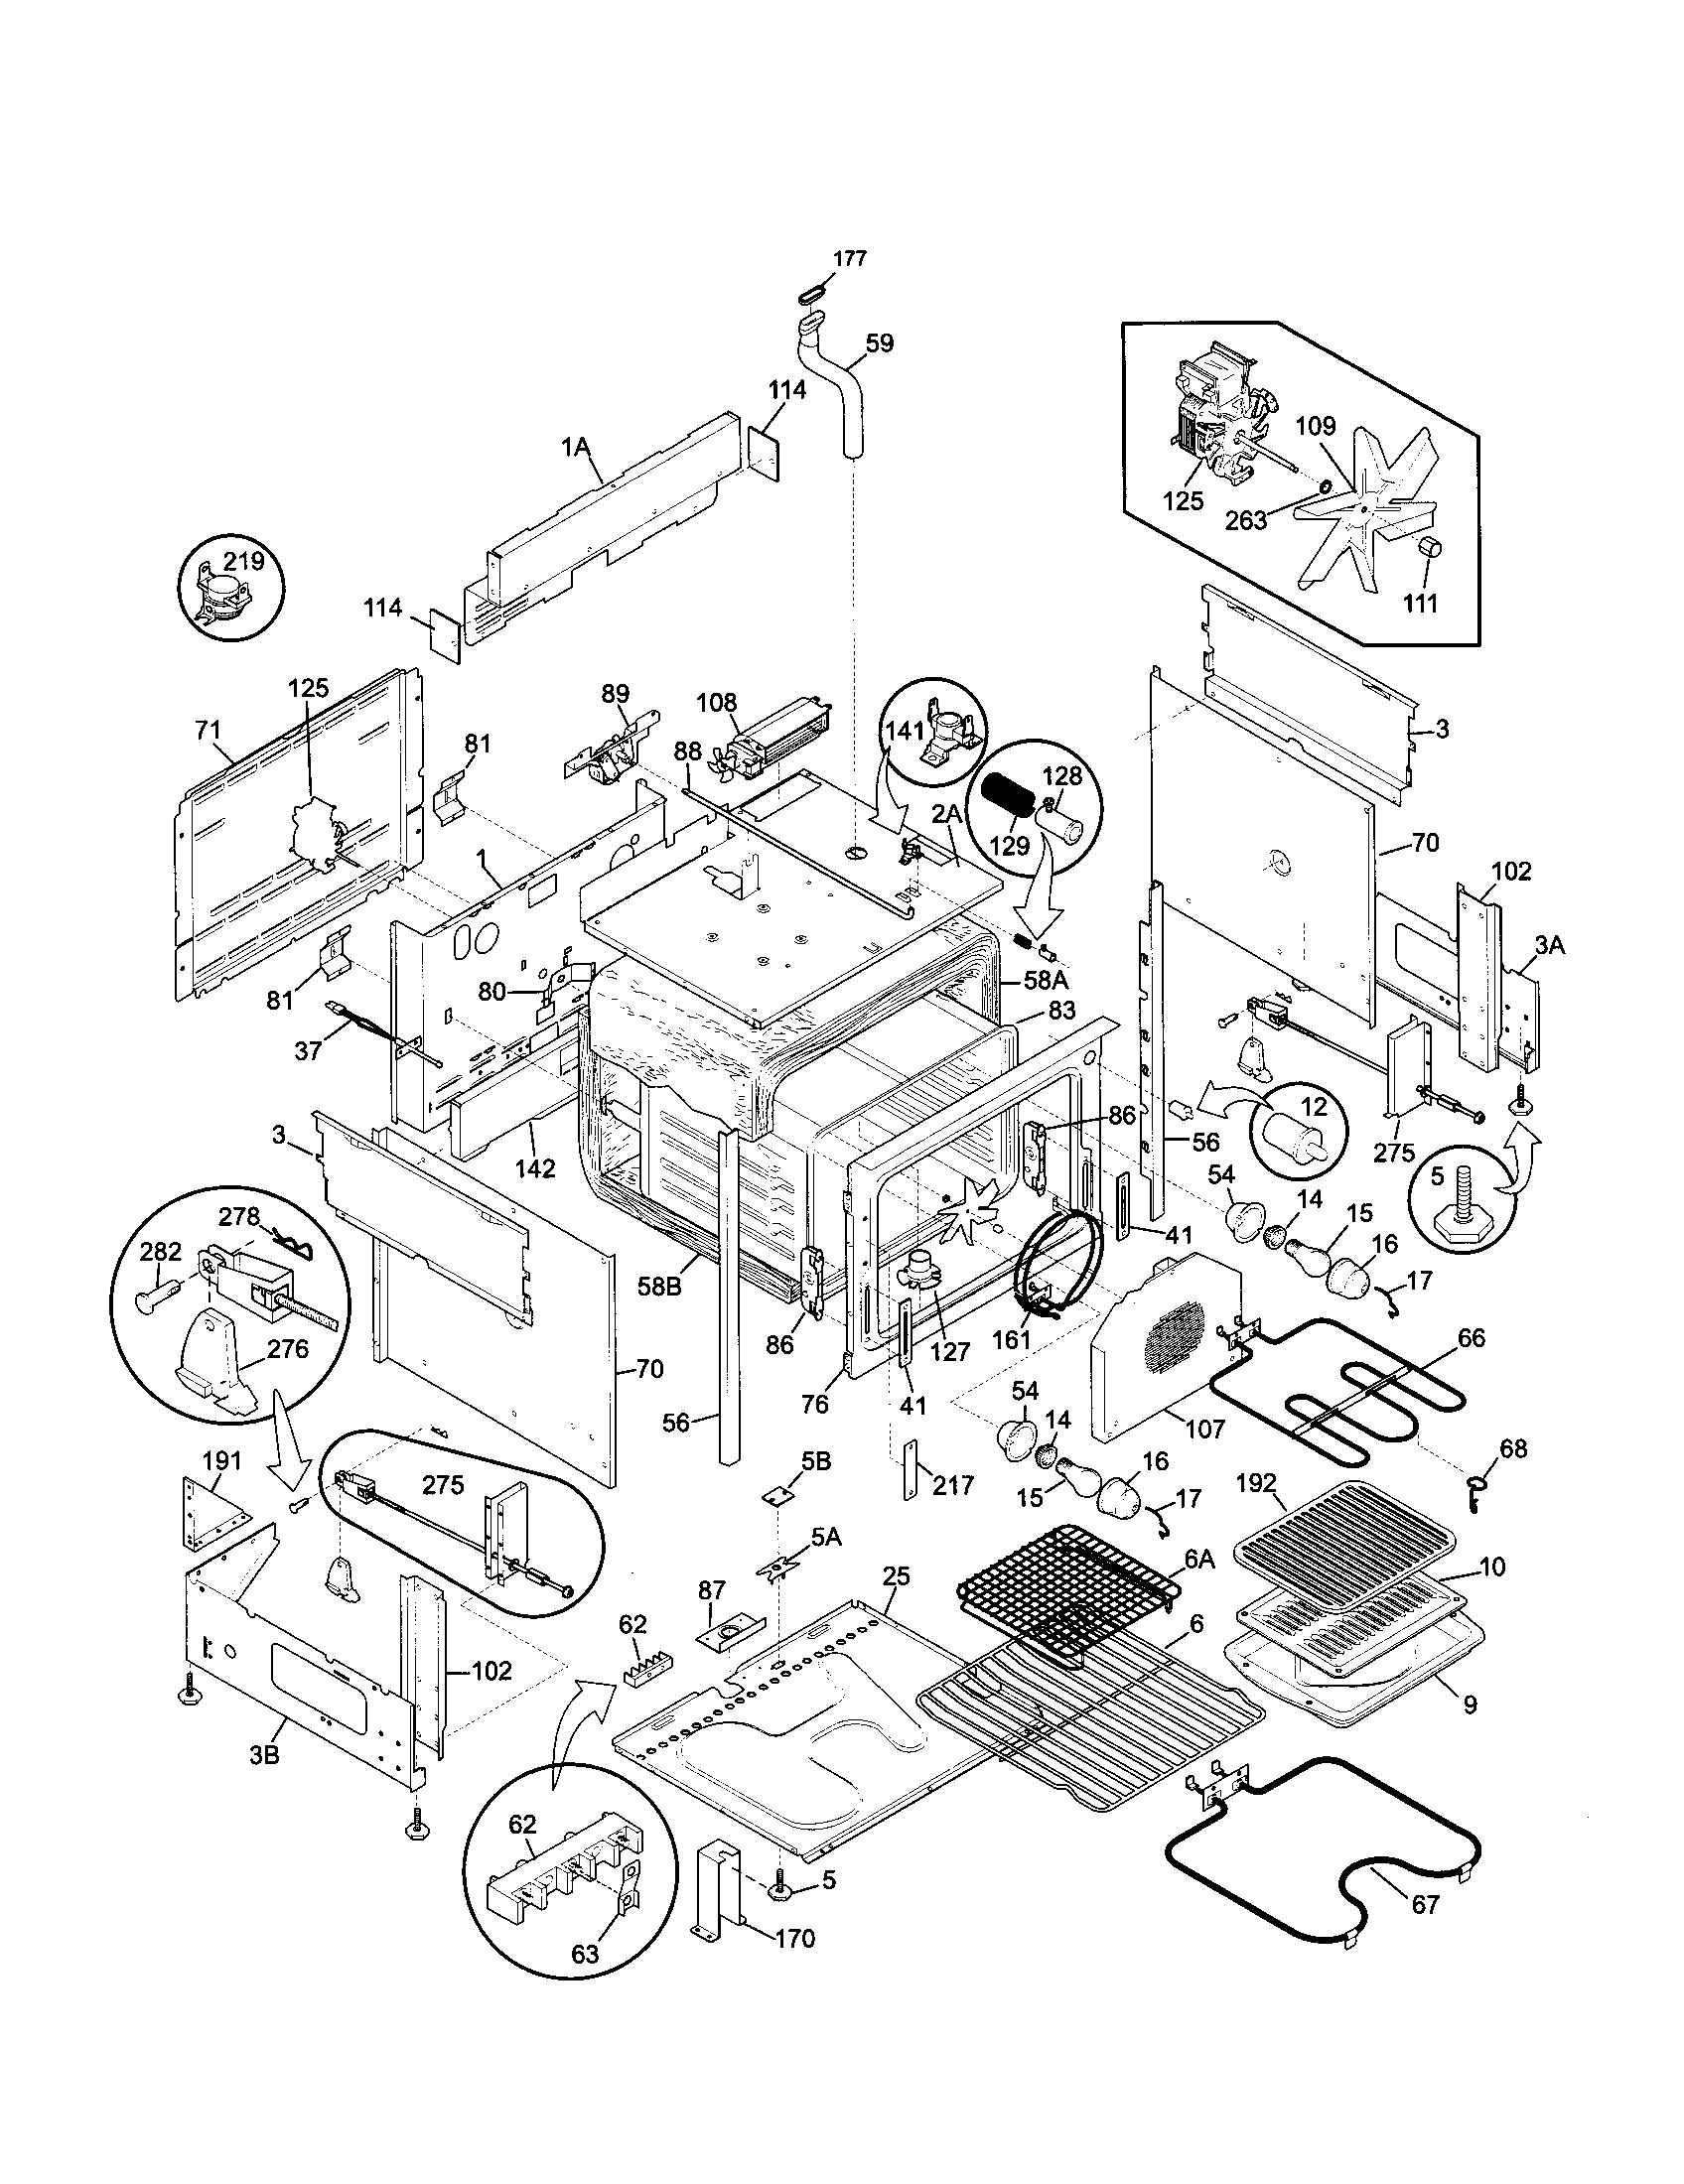 Kenmore Dishwasher Parts Diagram : kenmore, dishwasher, parts, diagram, Kenmore, 79046803991, Elite, Electric, Slide-In, Range, Timer, Stove, Clocks, Appliance, Timers